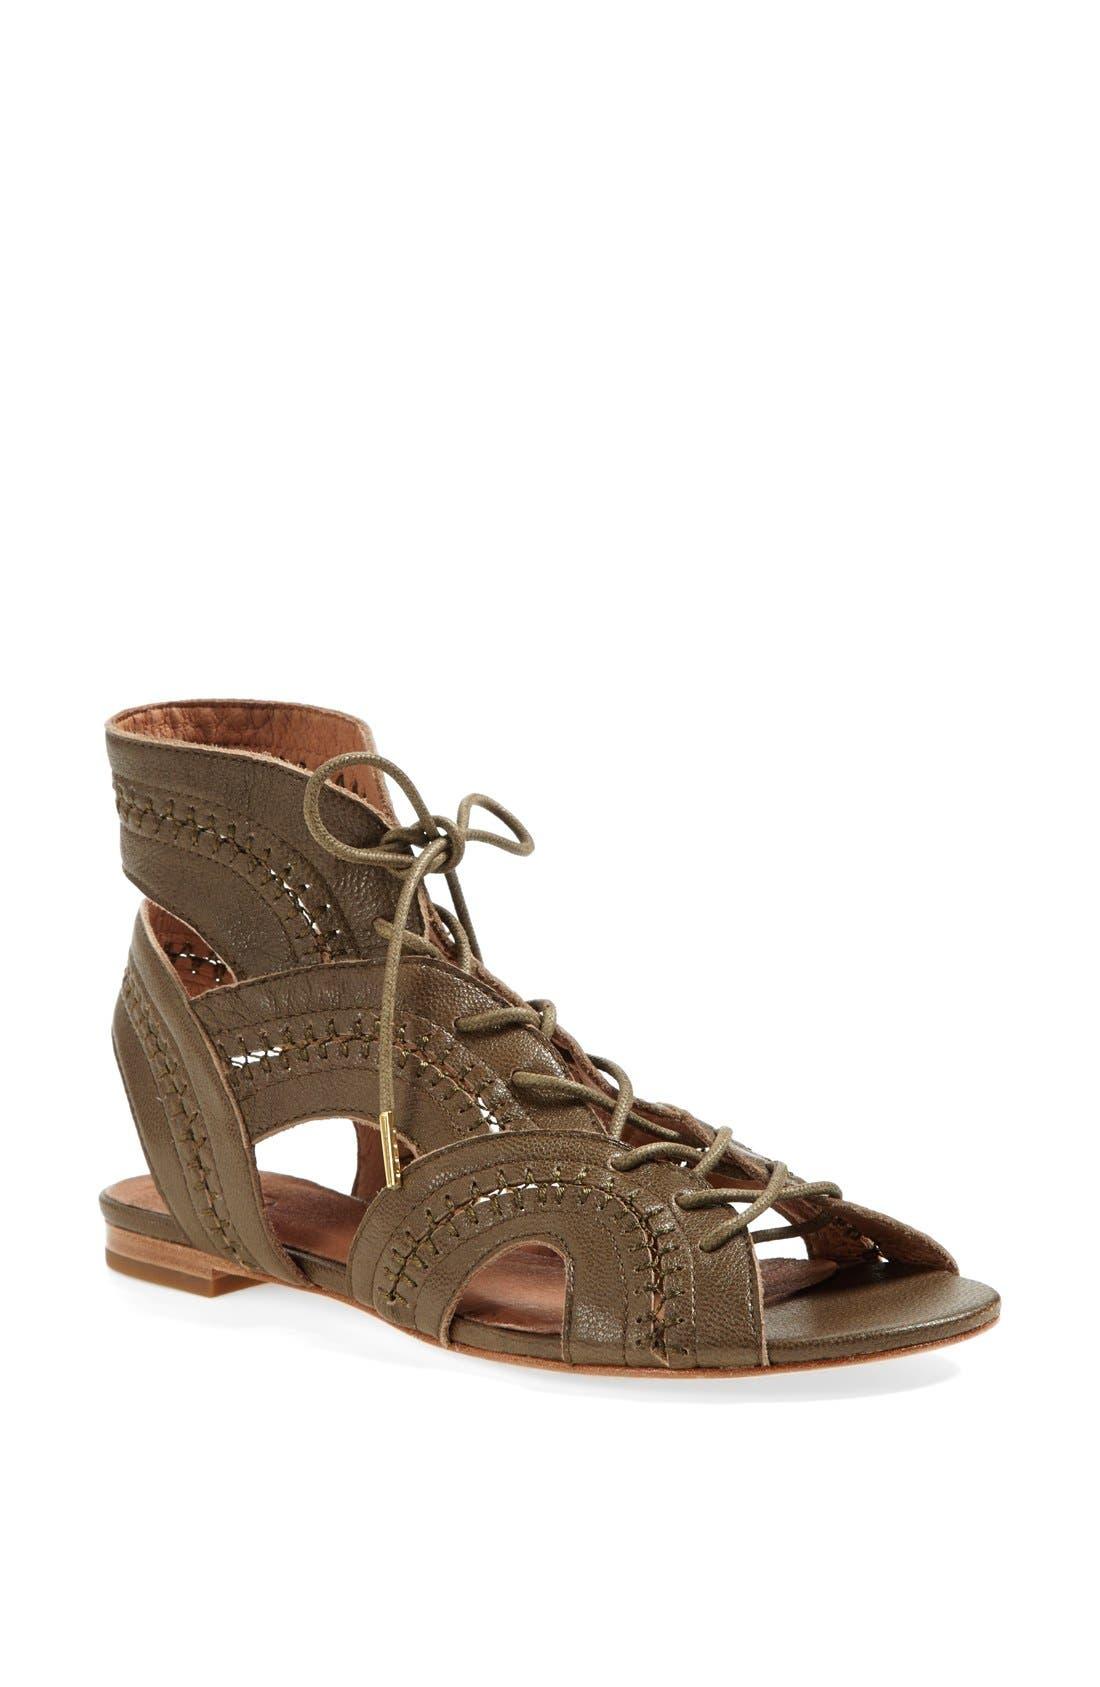 Main Image - Joie 'Toledo' Sandal